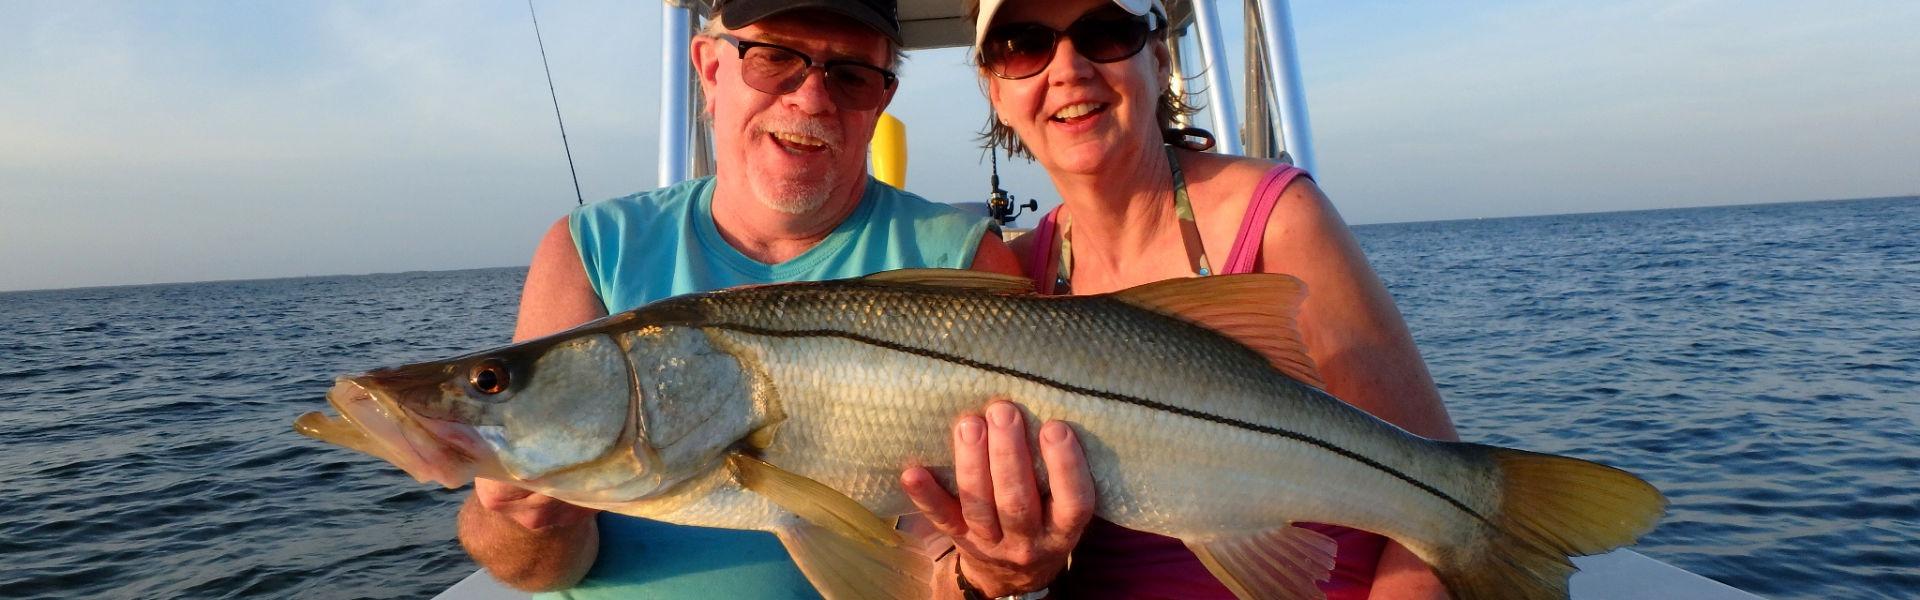 Snook Fishing Adventures